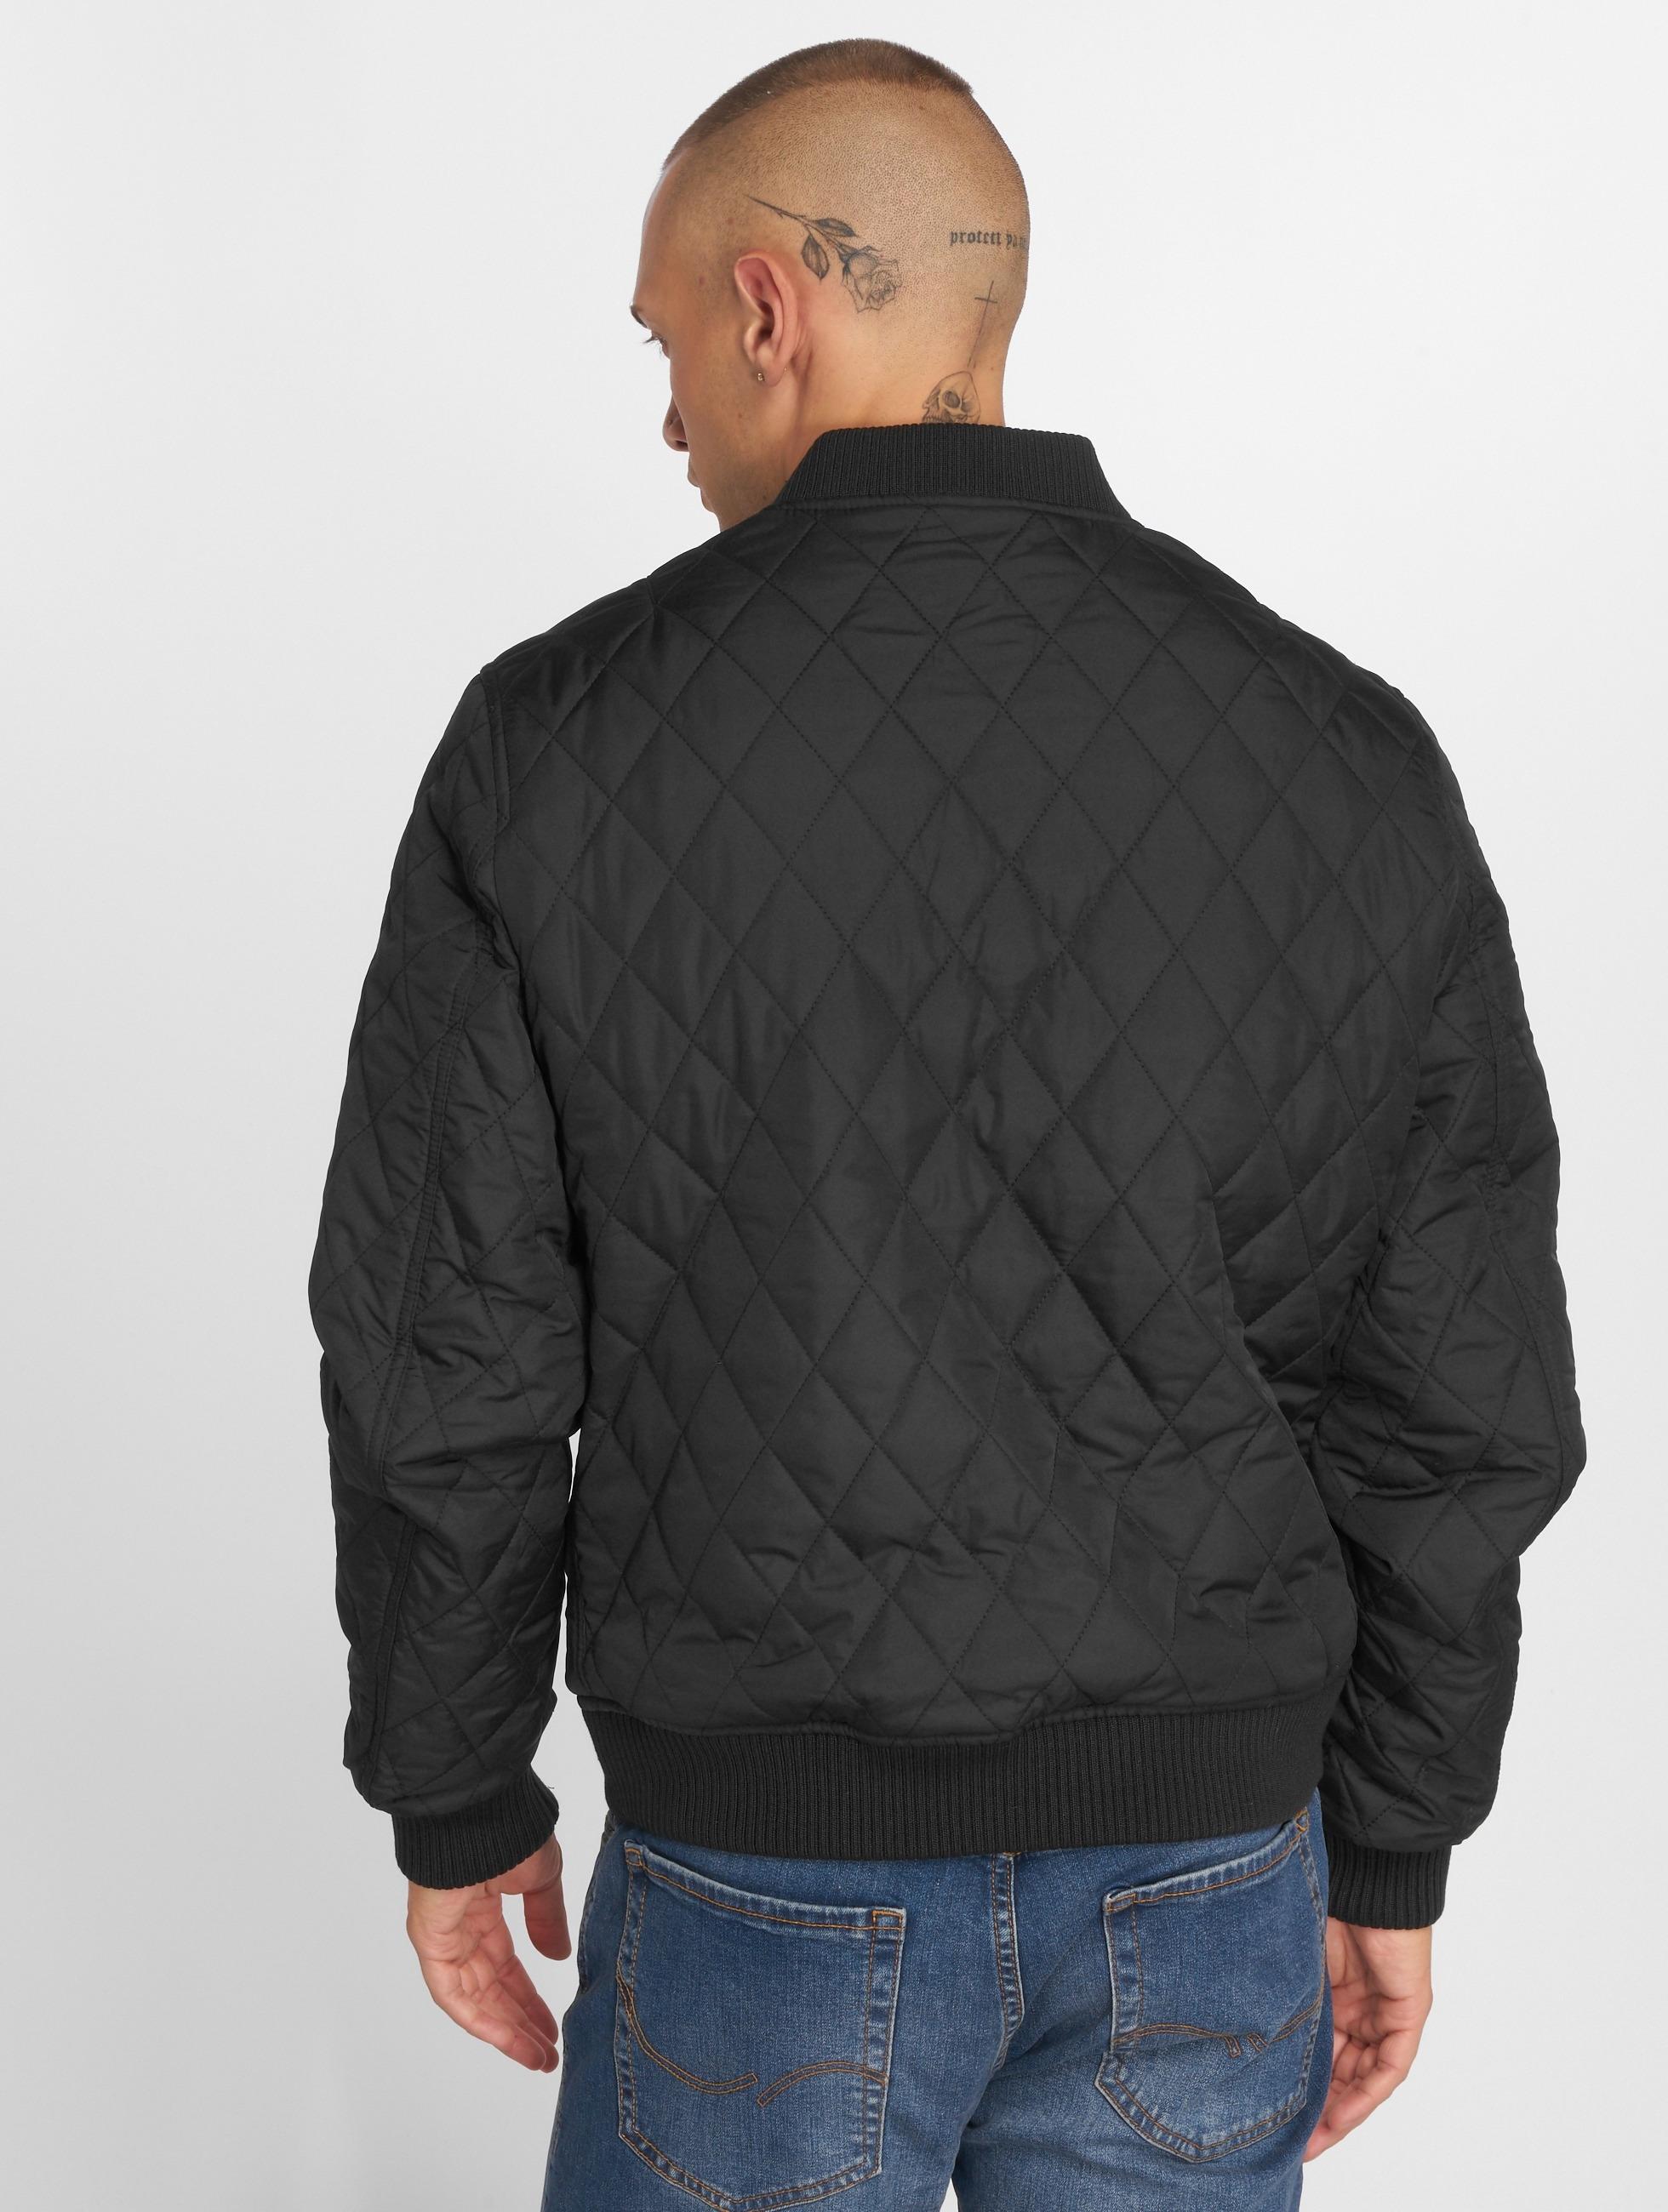 Urban Classics Übergangsjacke Diamond Quilt Nylon schwarz